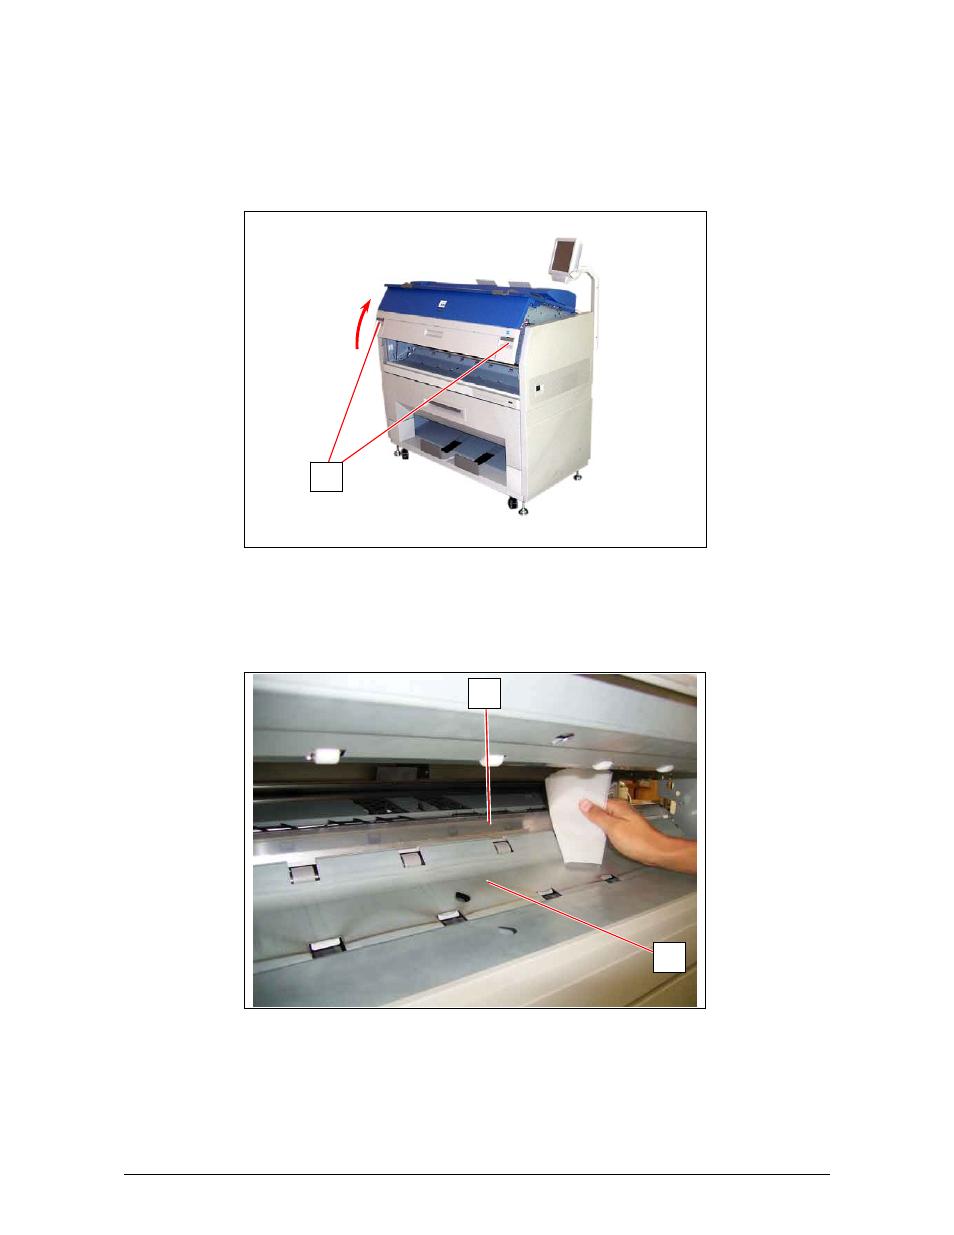 1 2 print engine konica minolta kip 3100 user manual page 54 56 rh manualsdir com